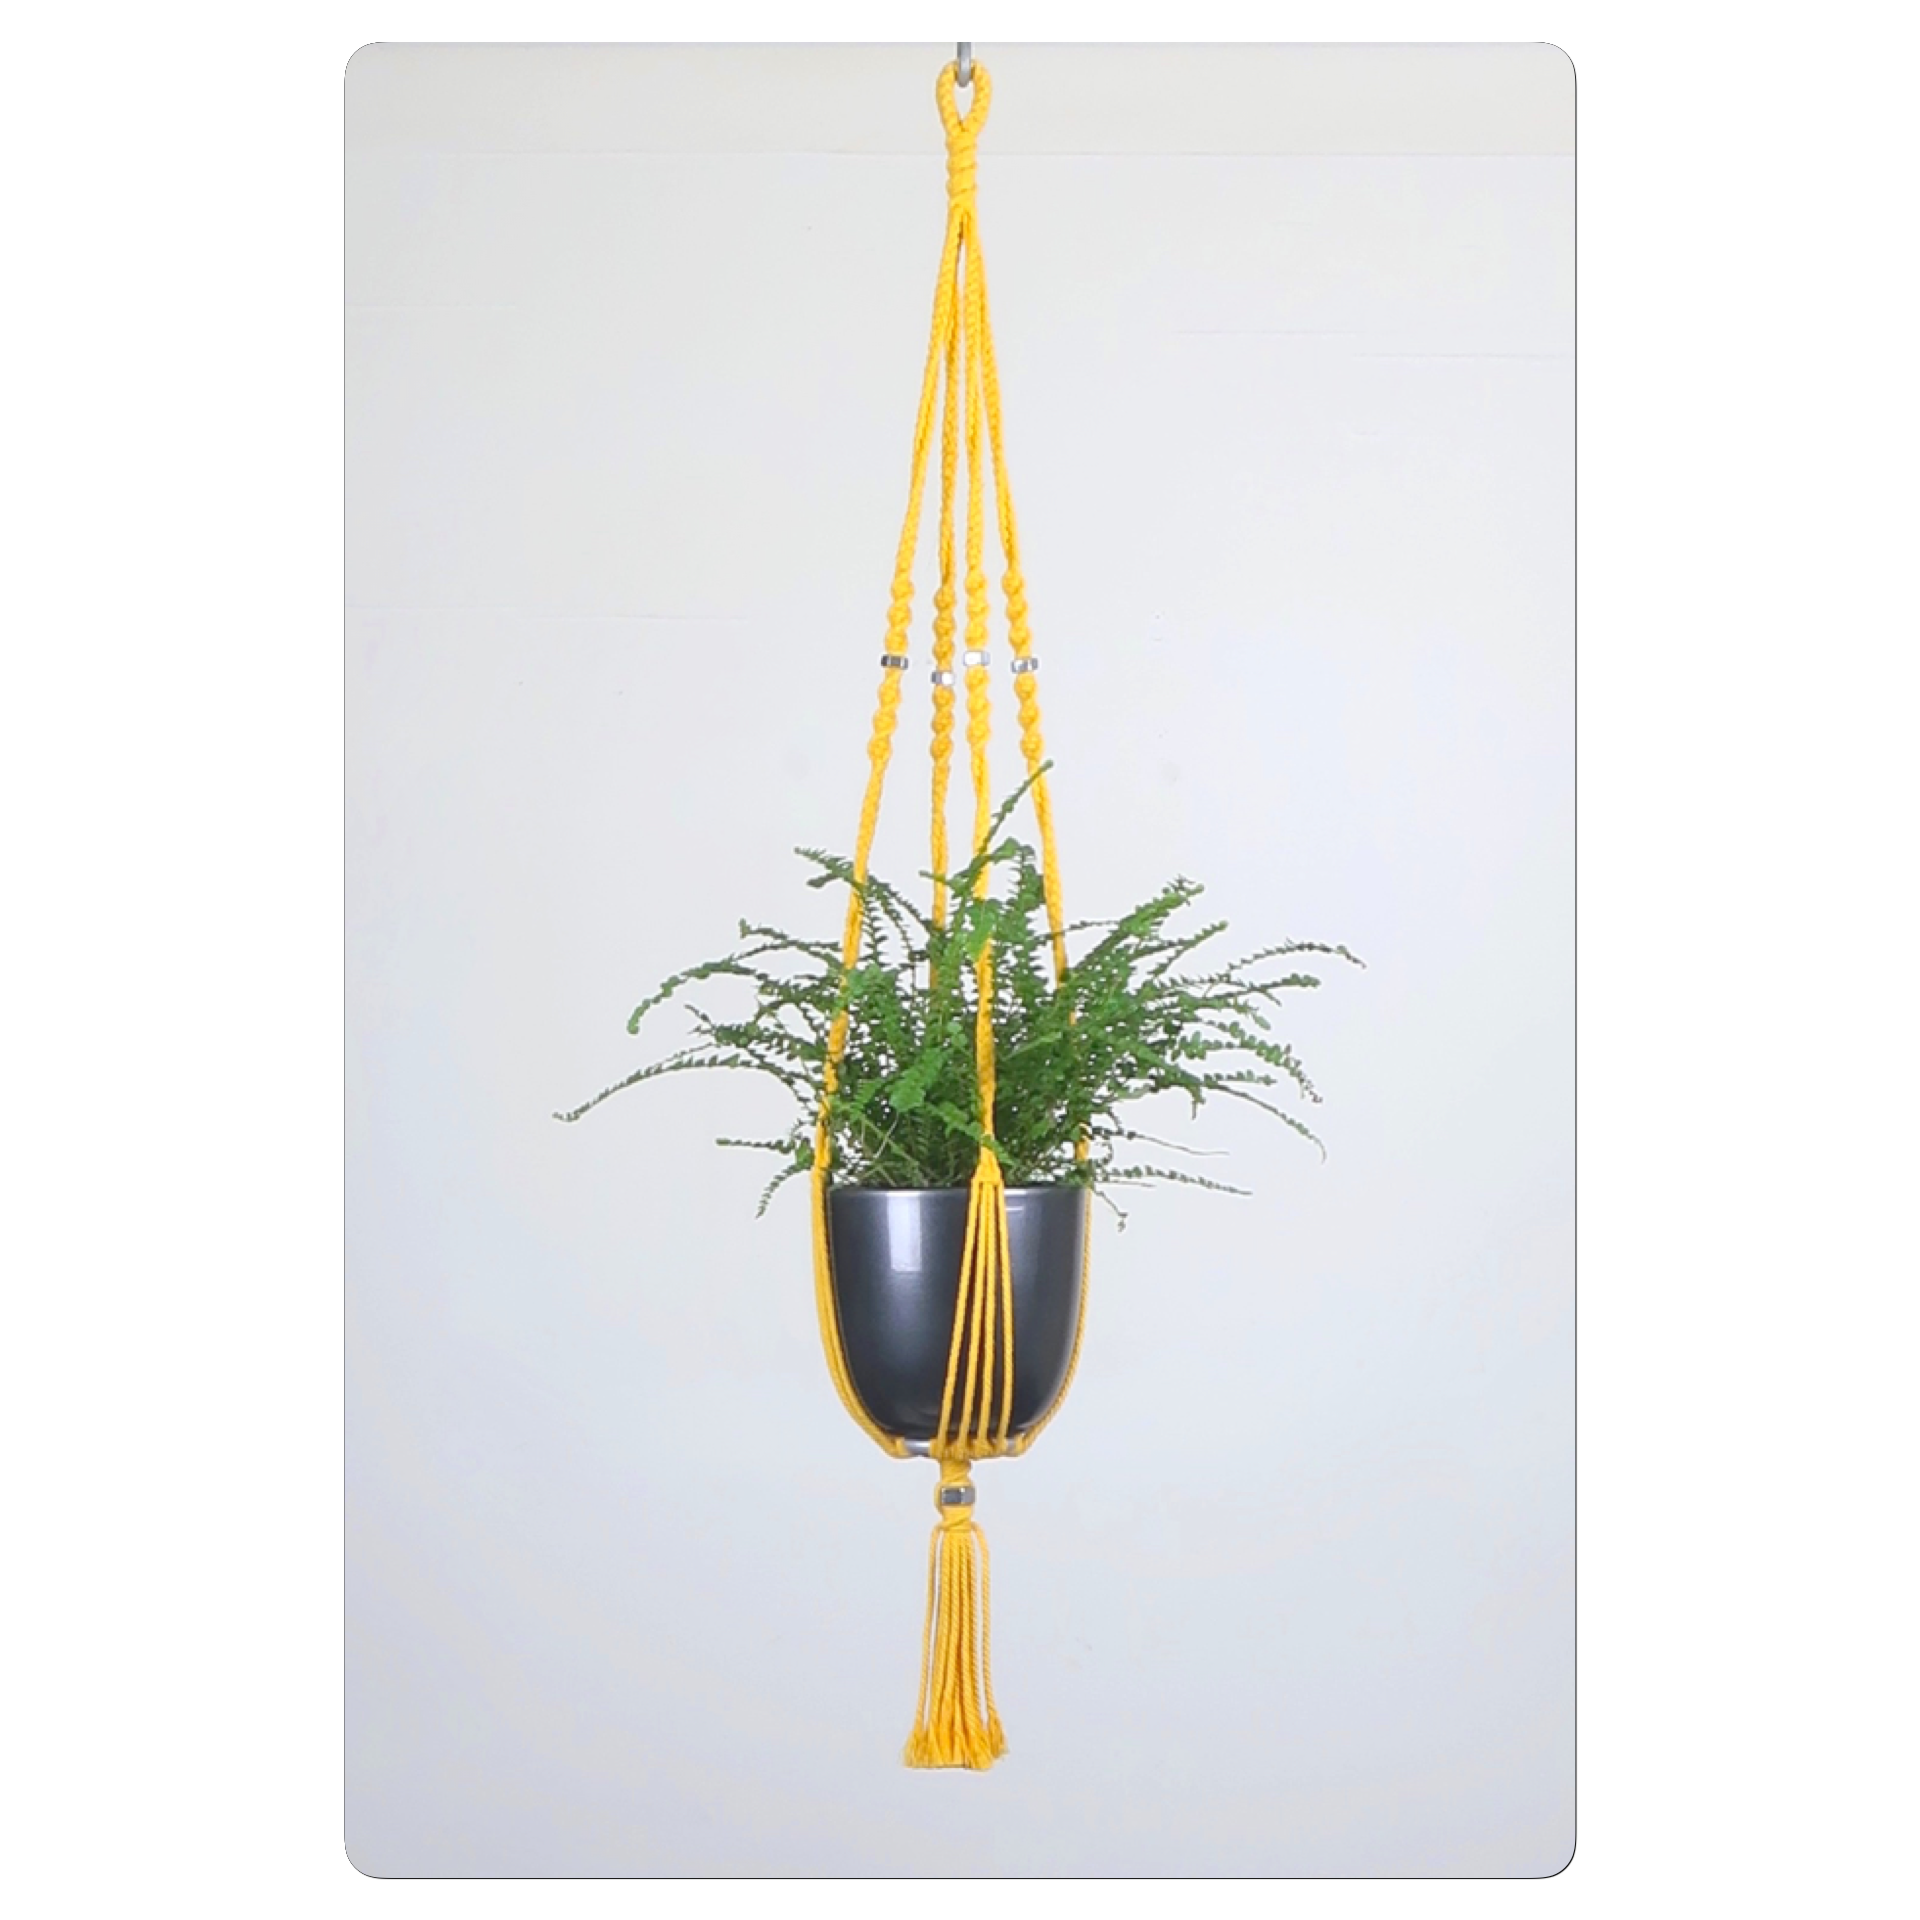 suspension pour plante en macram bymadjo inty d co. Black Bedroom Furniture Sets. Home Design Ideas